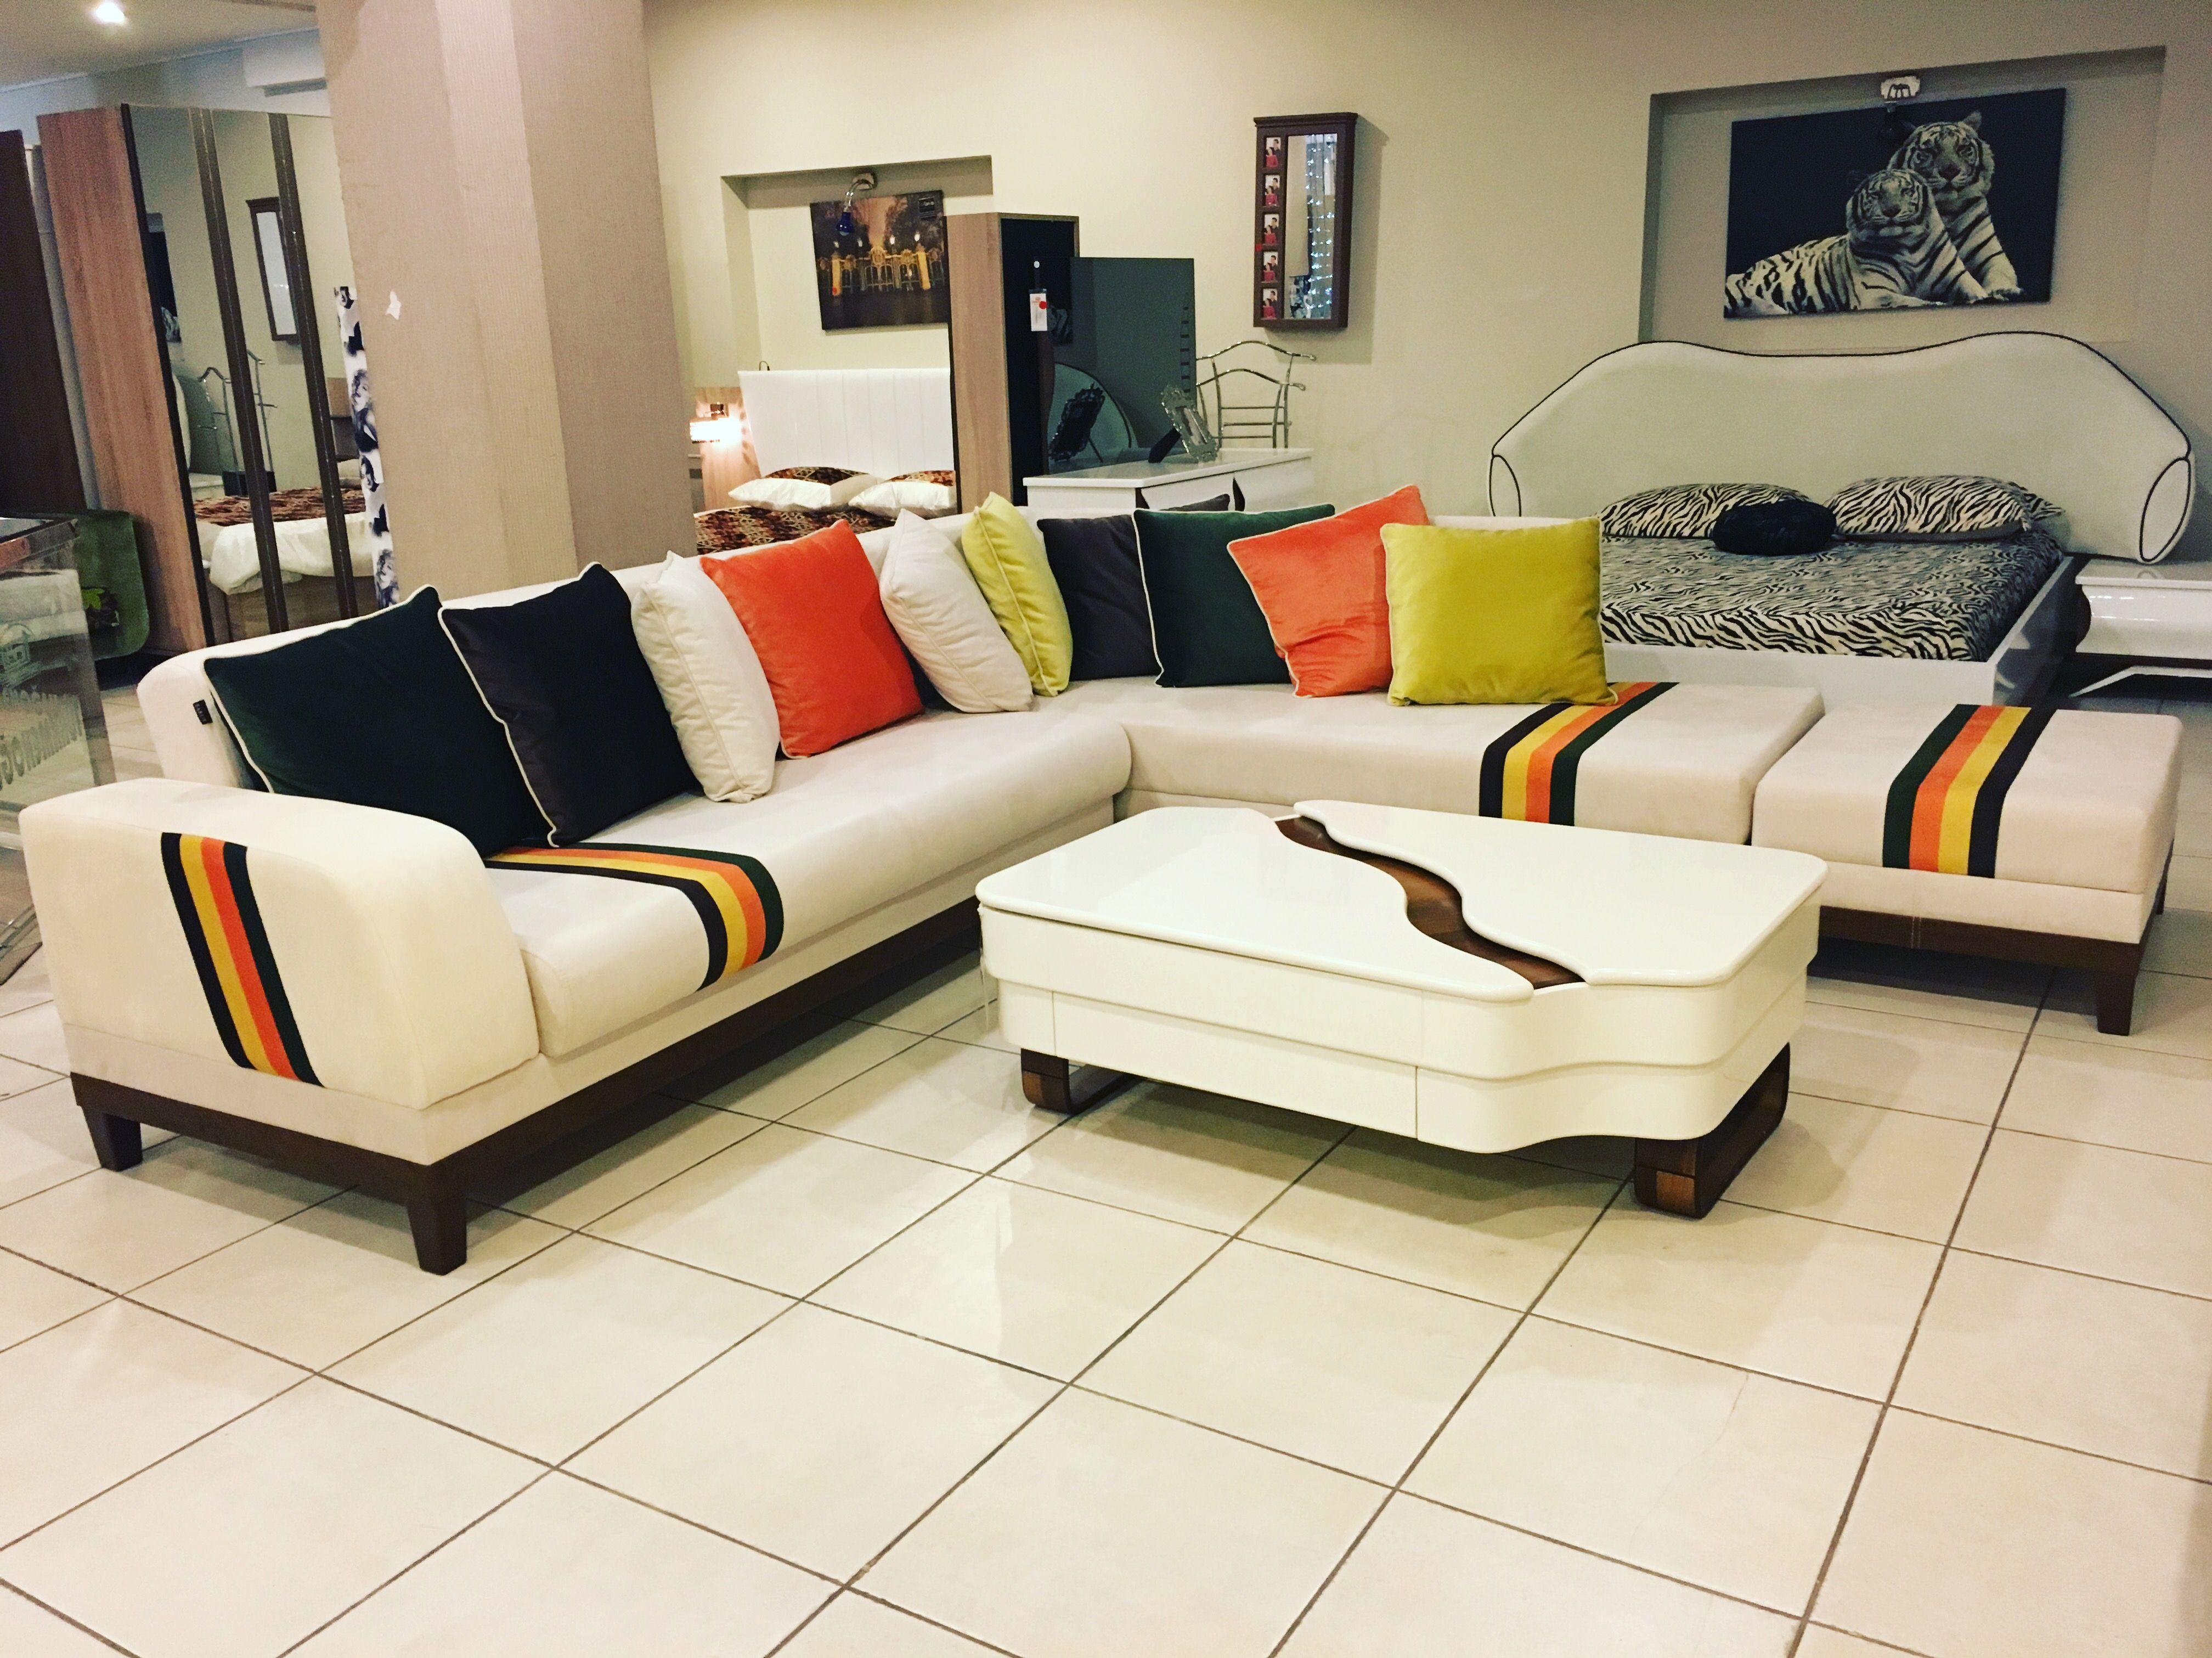 Pin De Lafdil Em Turkmenoglu Koltuk Takimlari Sofa And Living Room Sets Decoracao De Casa Sofa Tufado Sofa